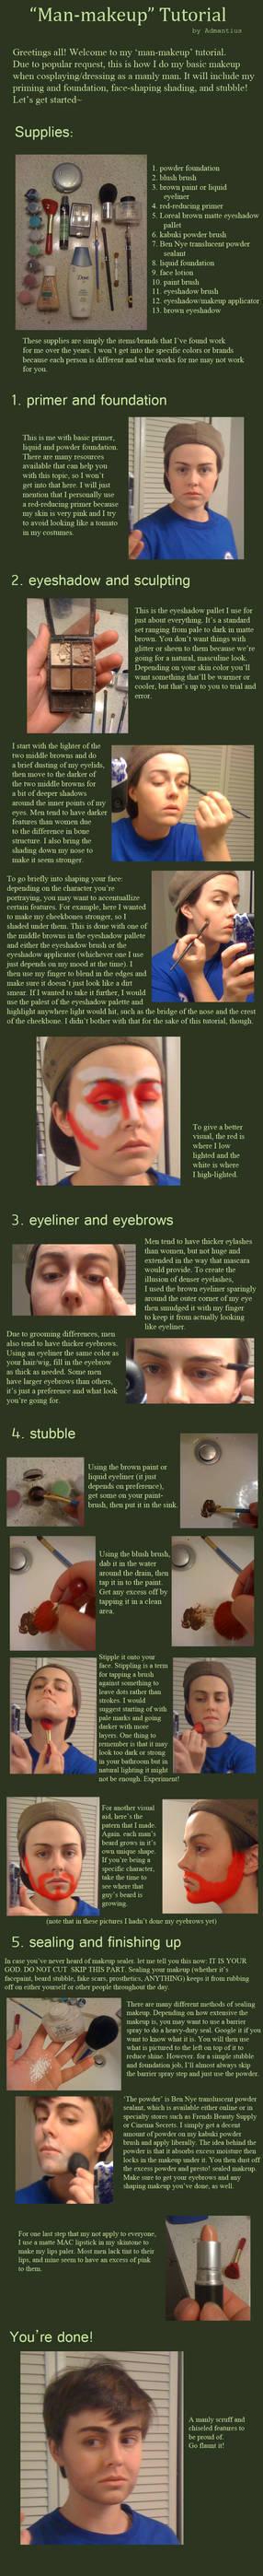 'Man-Makeup' and Stubble Tutorial